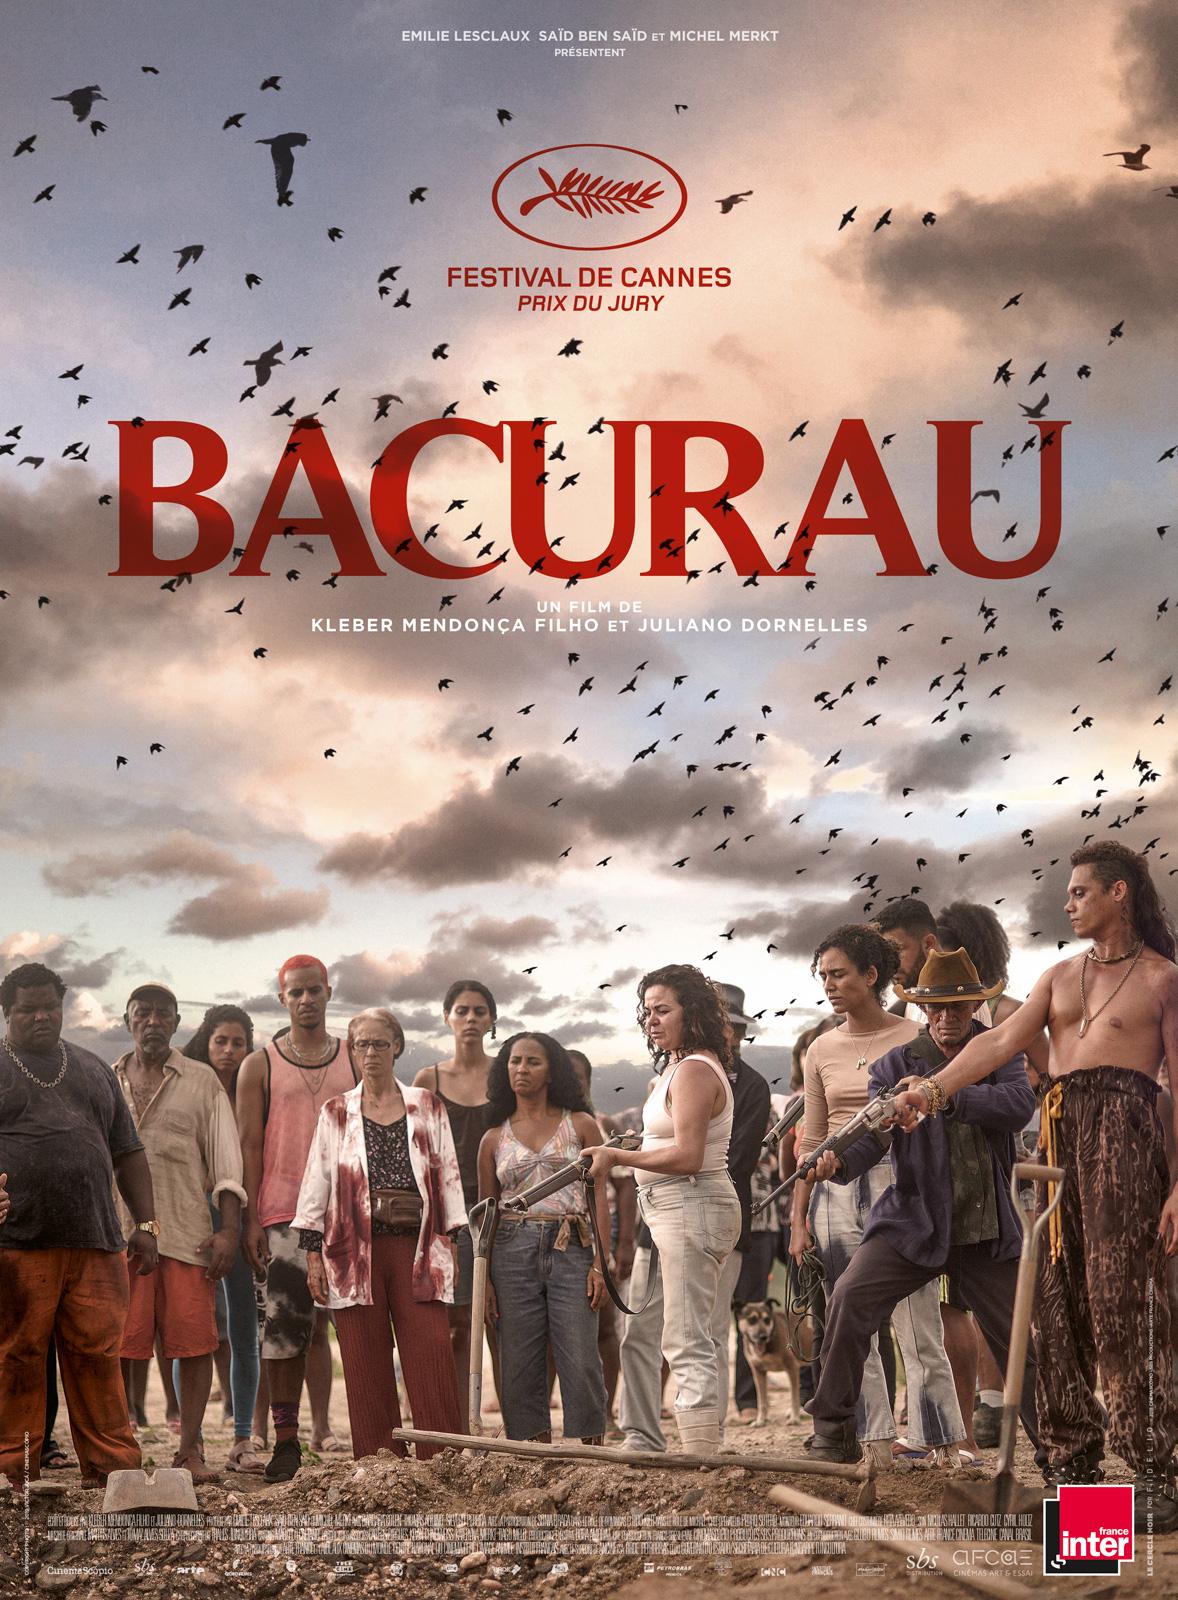 Image du film Bacurau